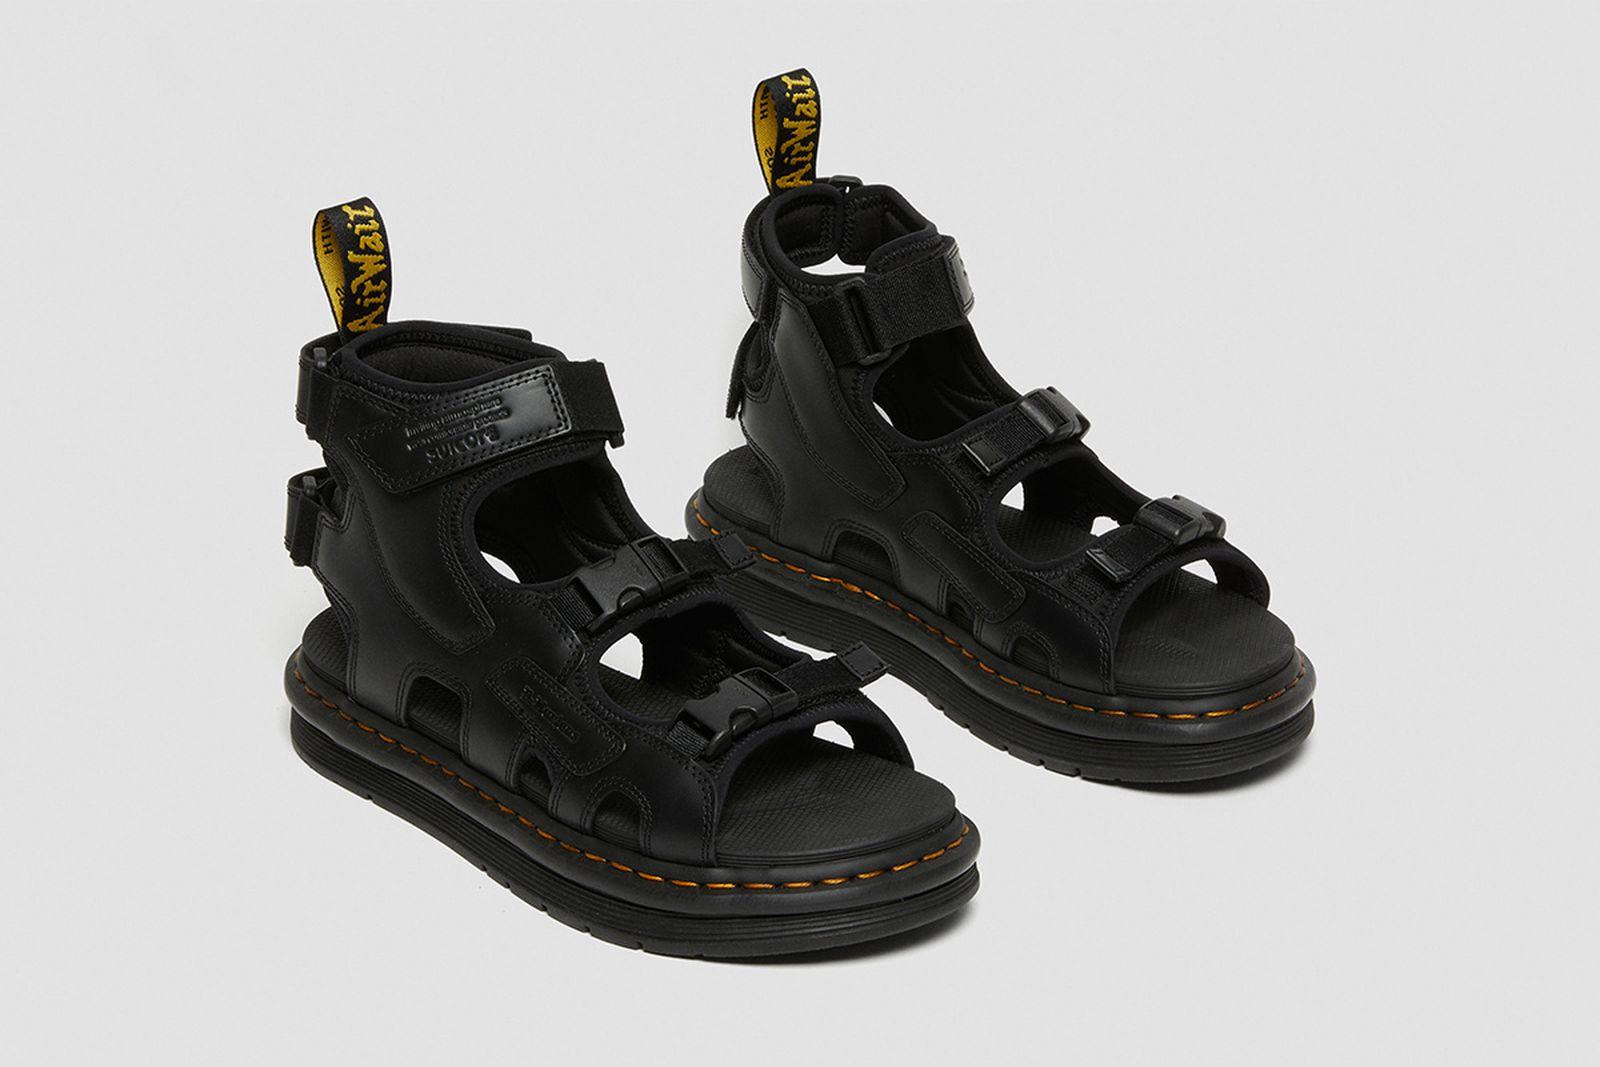 dr-martens-suicoke-sandals-release-date-price-02